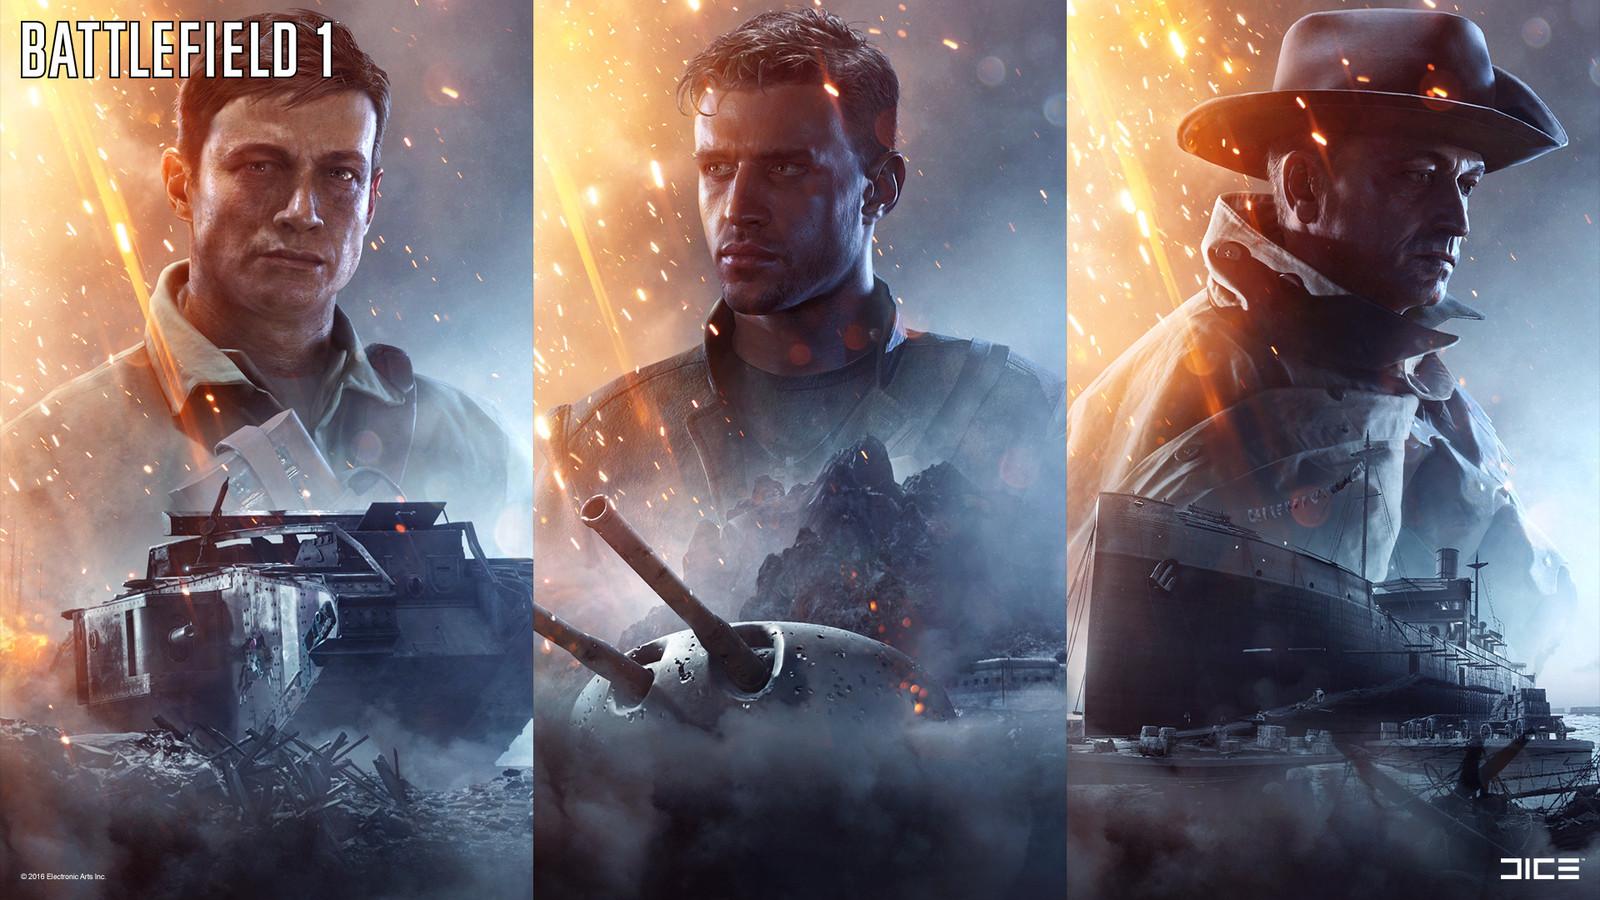 """Battlefield 1"" - War Stories Key Art - 02 / Collaboration with Robert Sammelin & the DICE Character team"